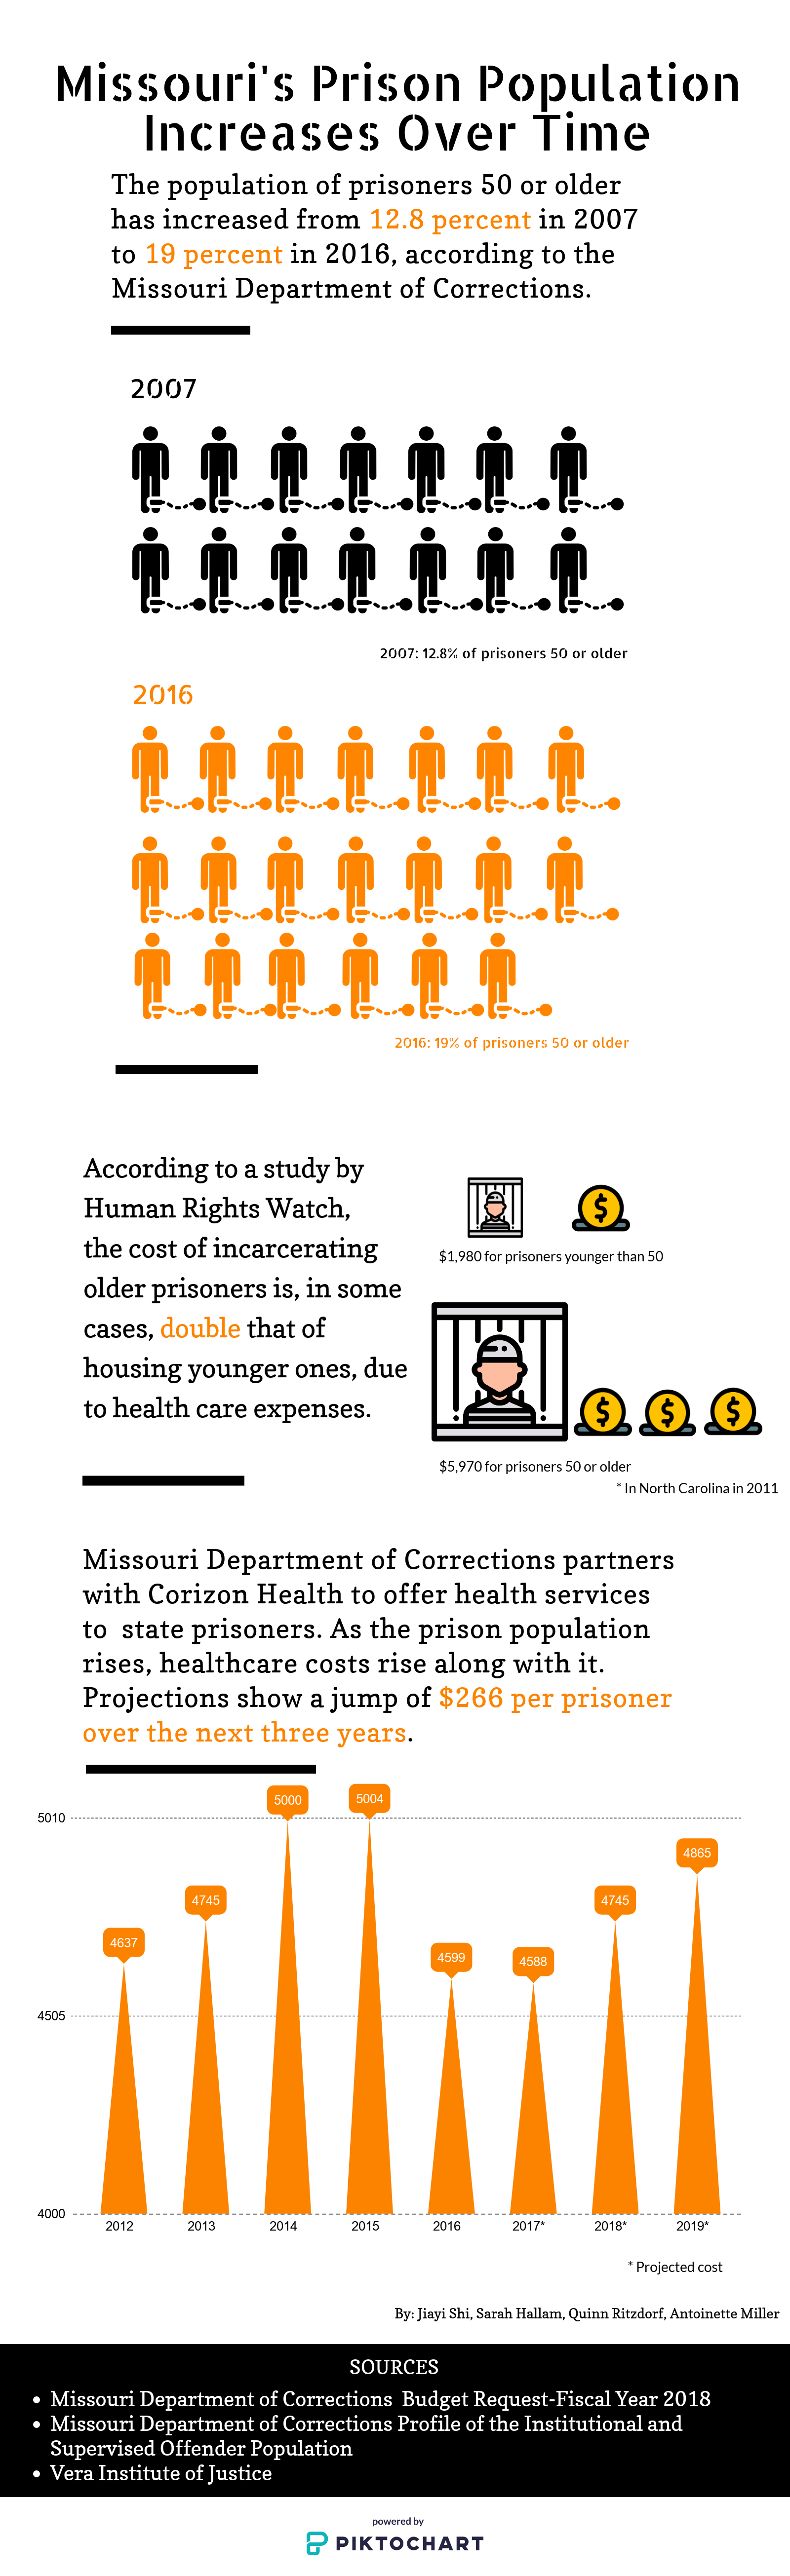 OLDERPRISONERS0405_infographic.png